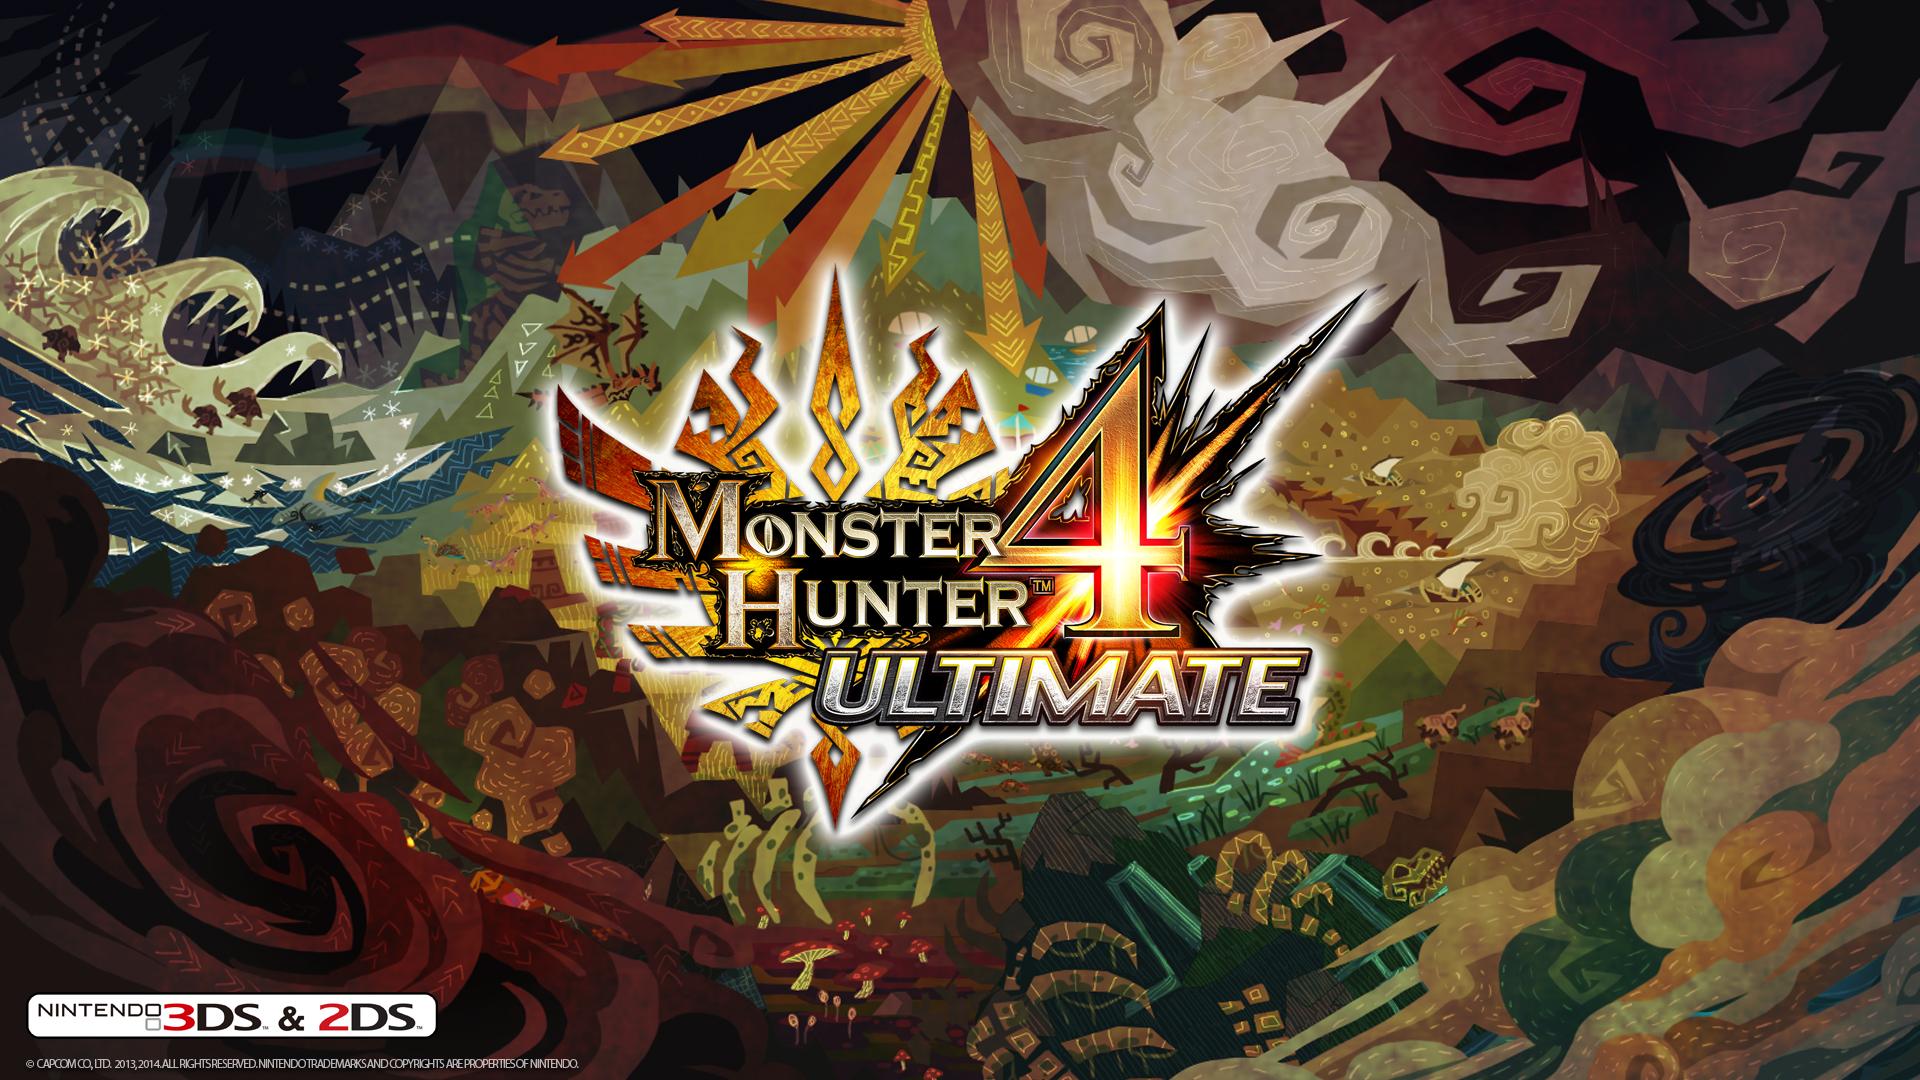 Capcom Announces Monster Hunter 4 Ultimate Has Surpassed 3